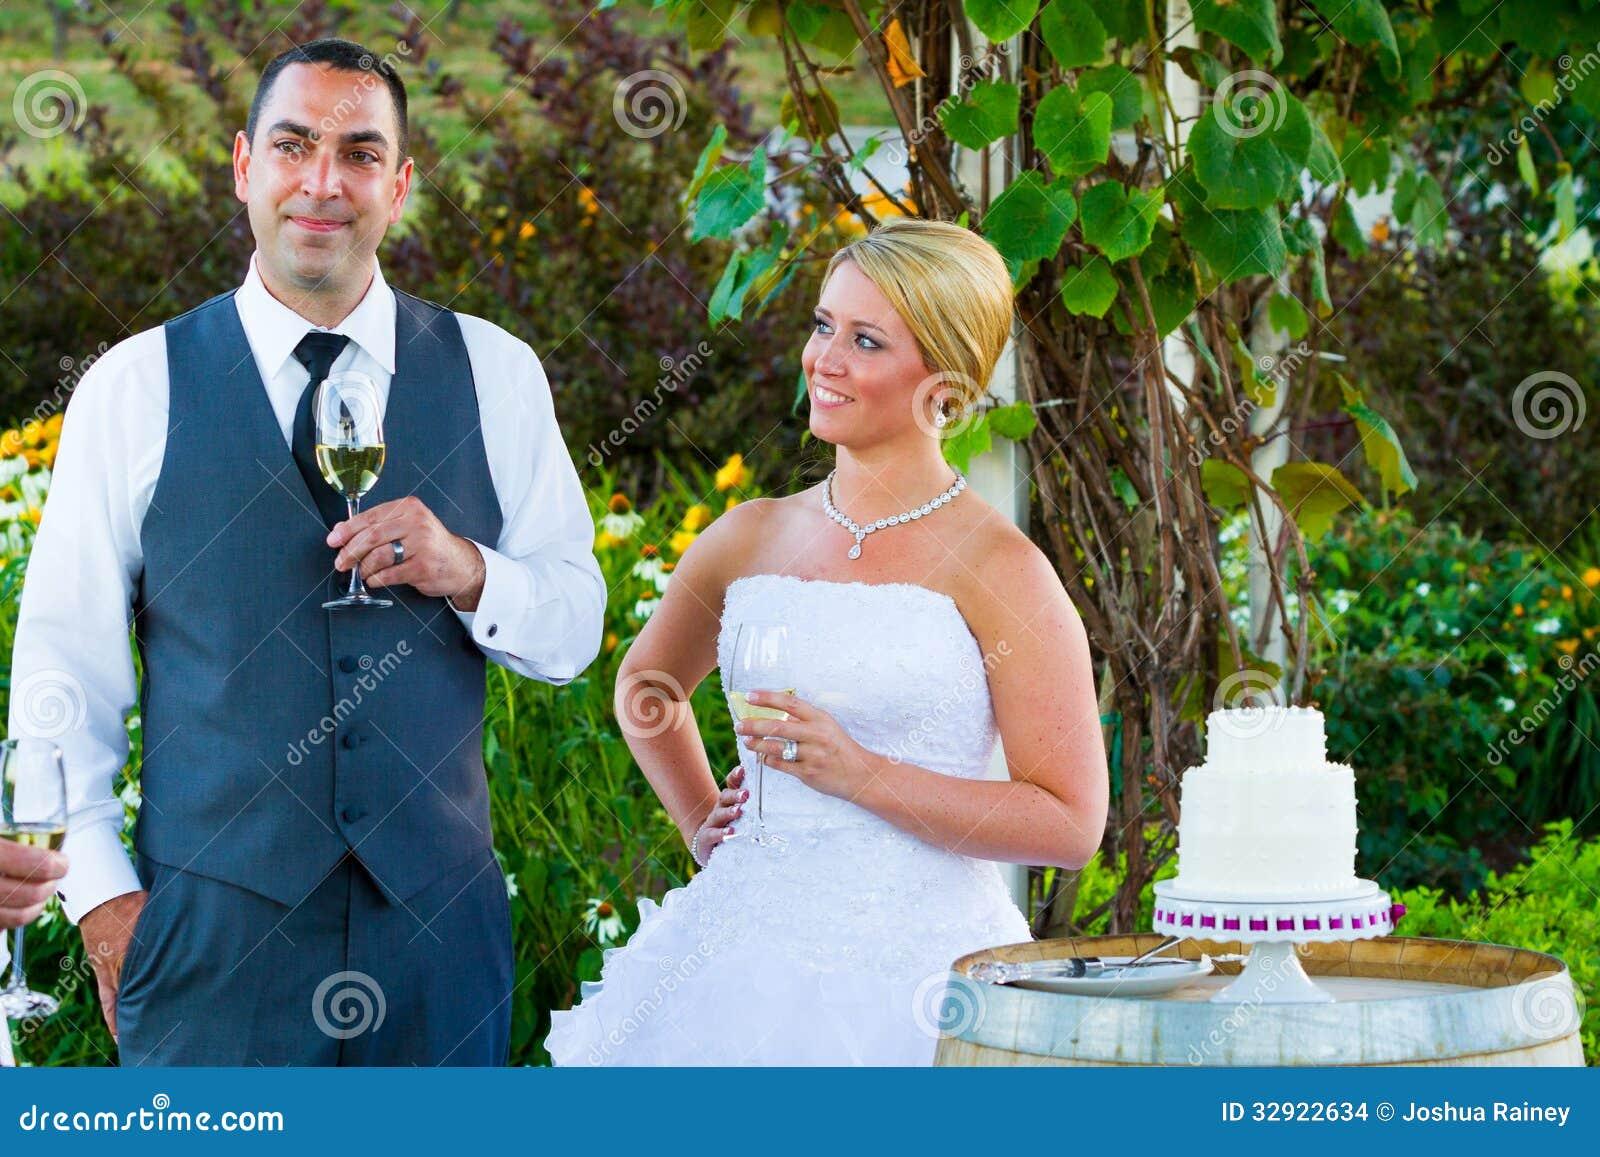 bride and groom wedding toasts stock photo image of wine